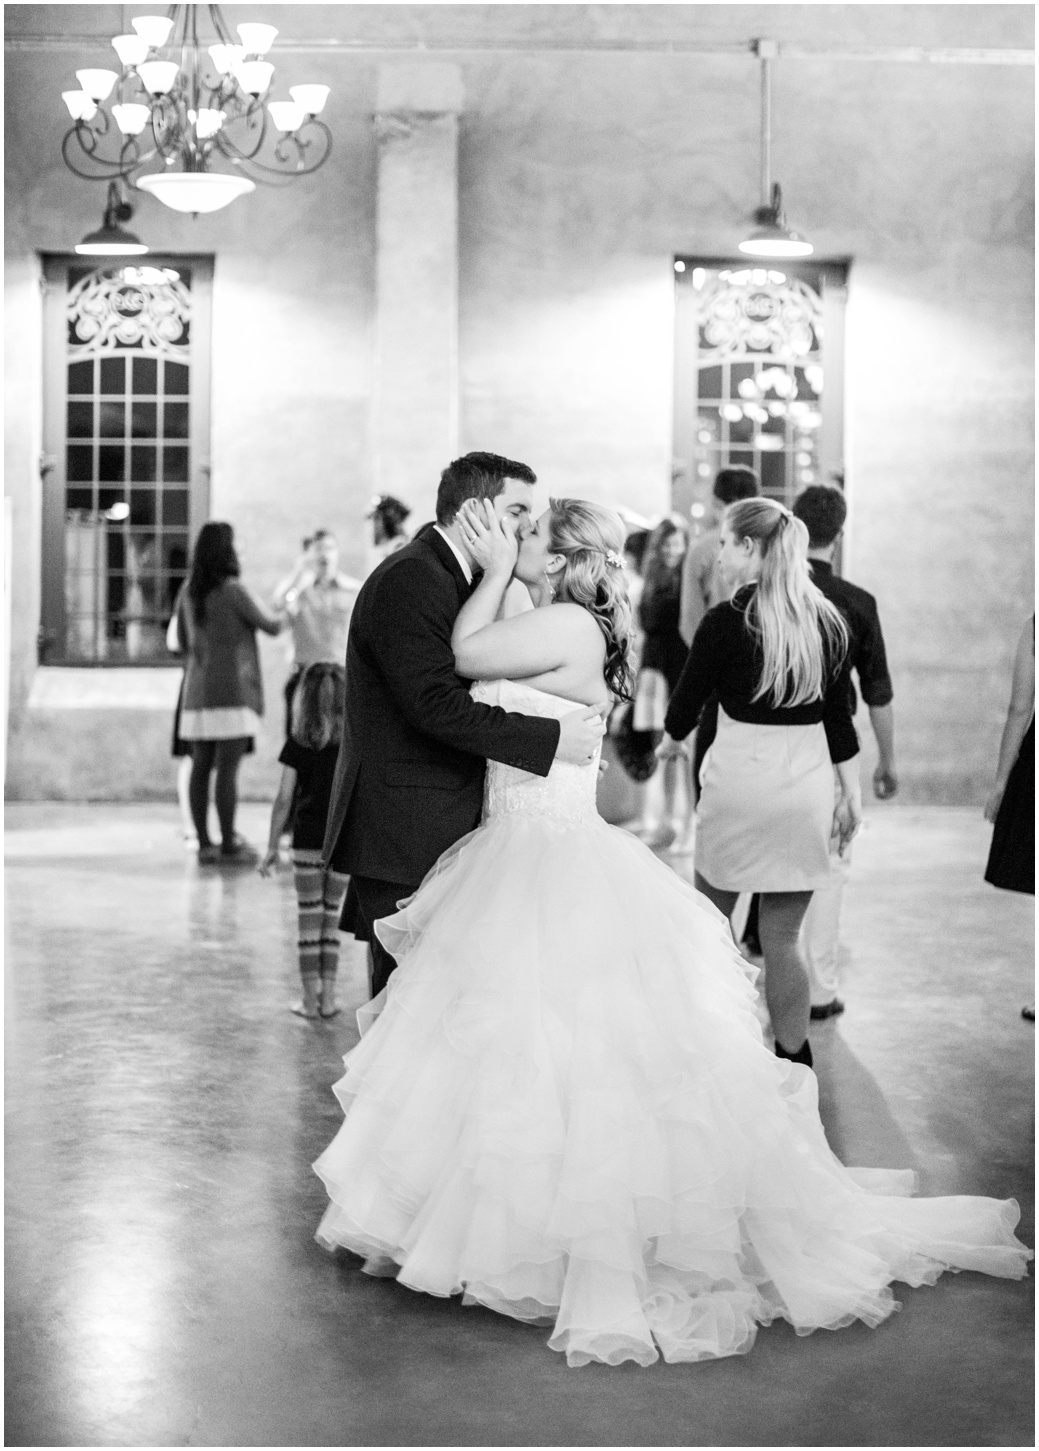 Sarah Best Photography - Jolly Wedding Olde Dobbin Station-500_STP.jpg